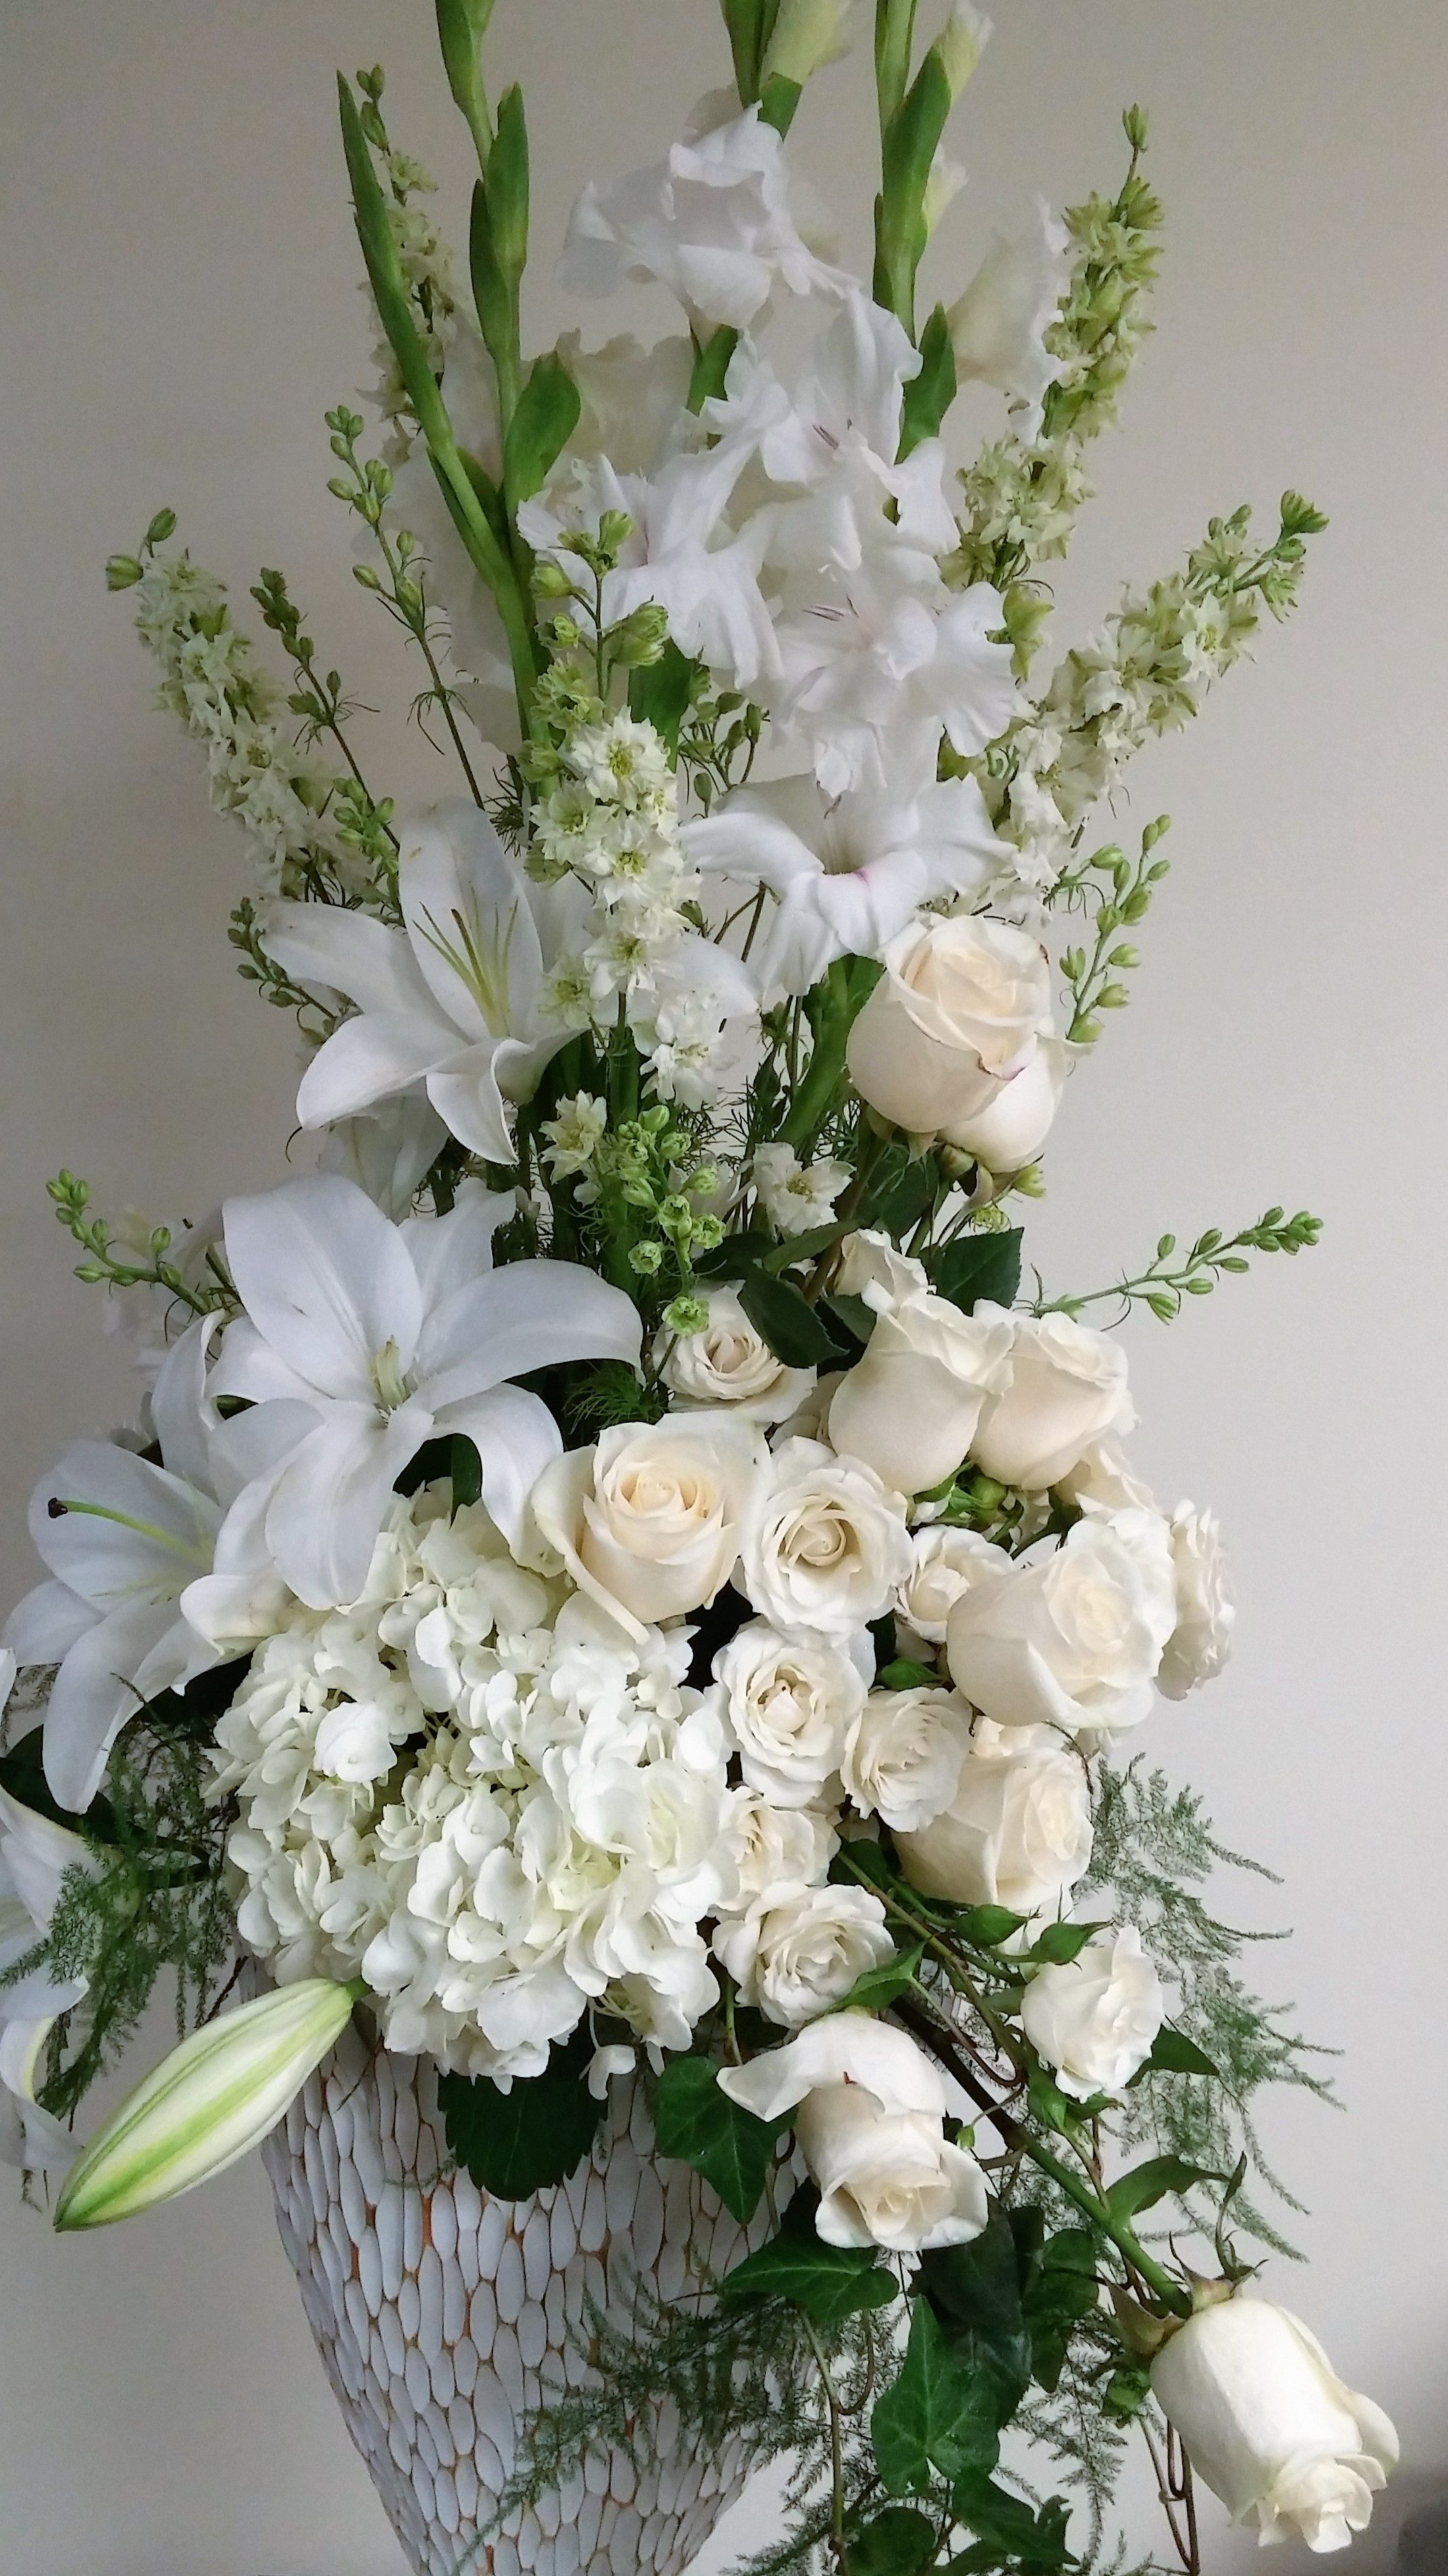 Tall white arrangement white gladiolus white oriental lilies tall white arrangement white gladiolus white oriental lilies white roses white hydrangea white spray roses and white larkspur wedeliverthewow mightylinksfo